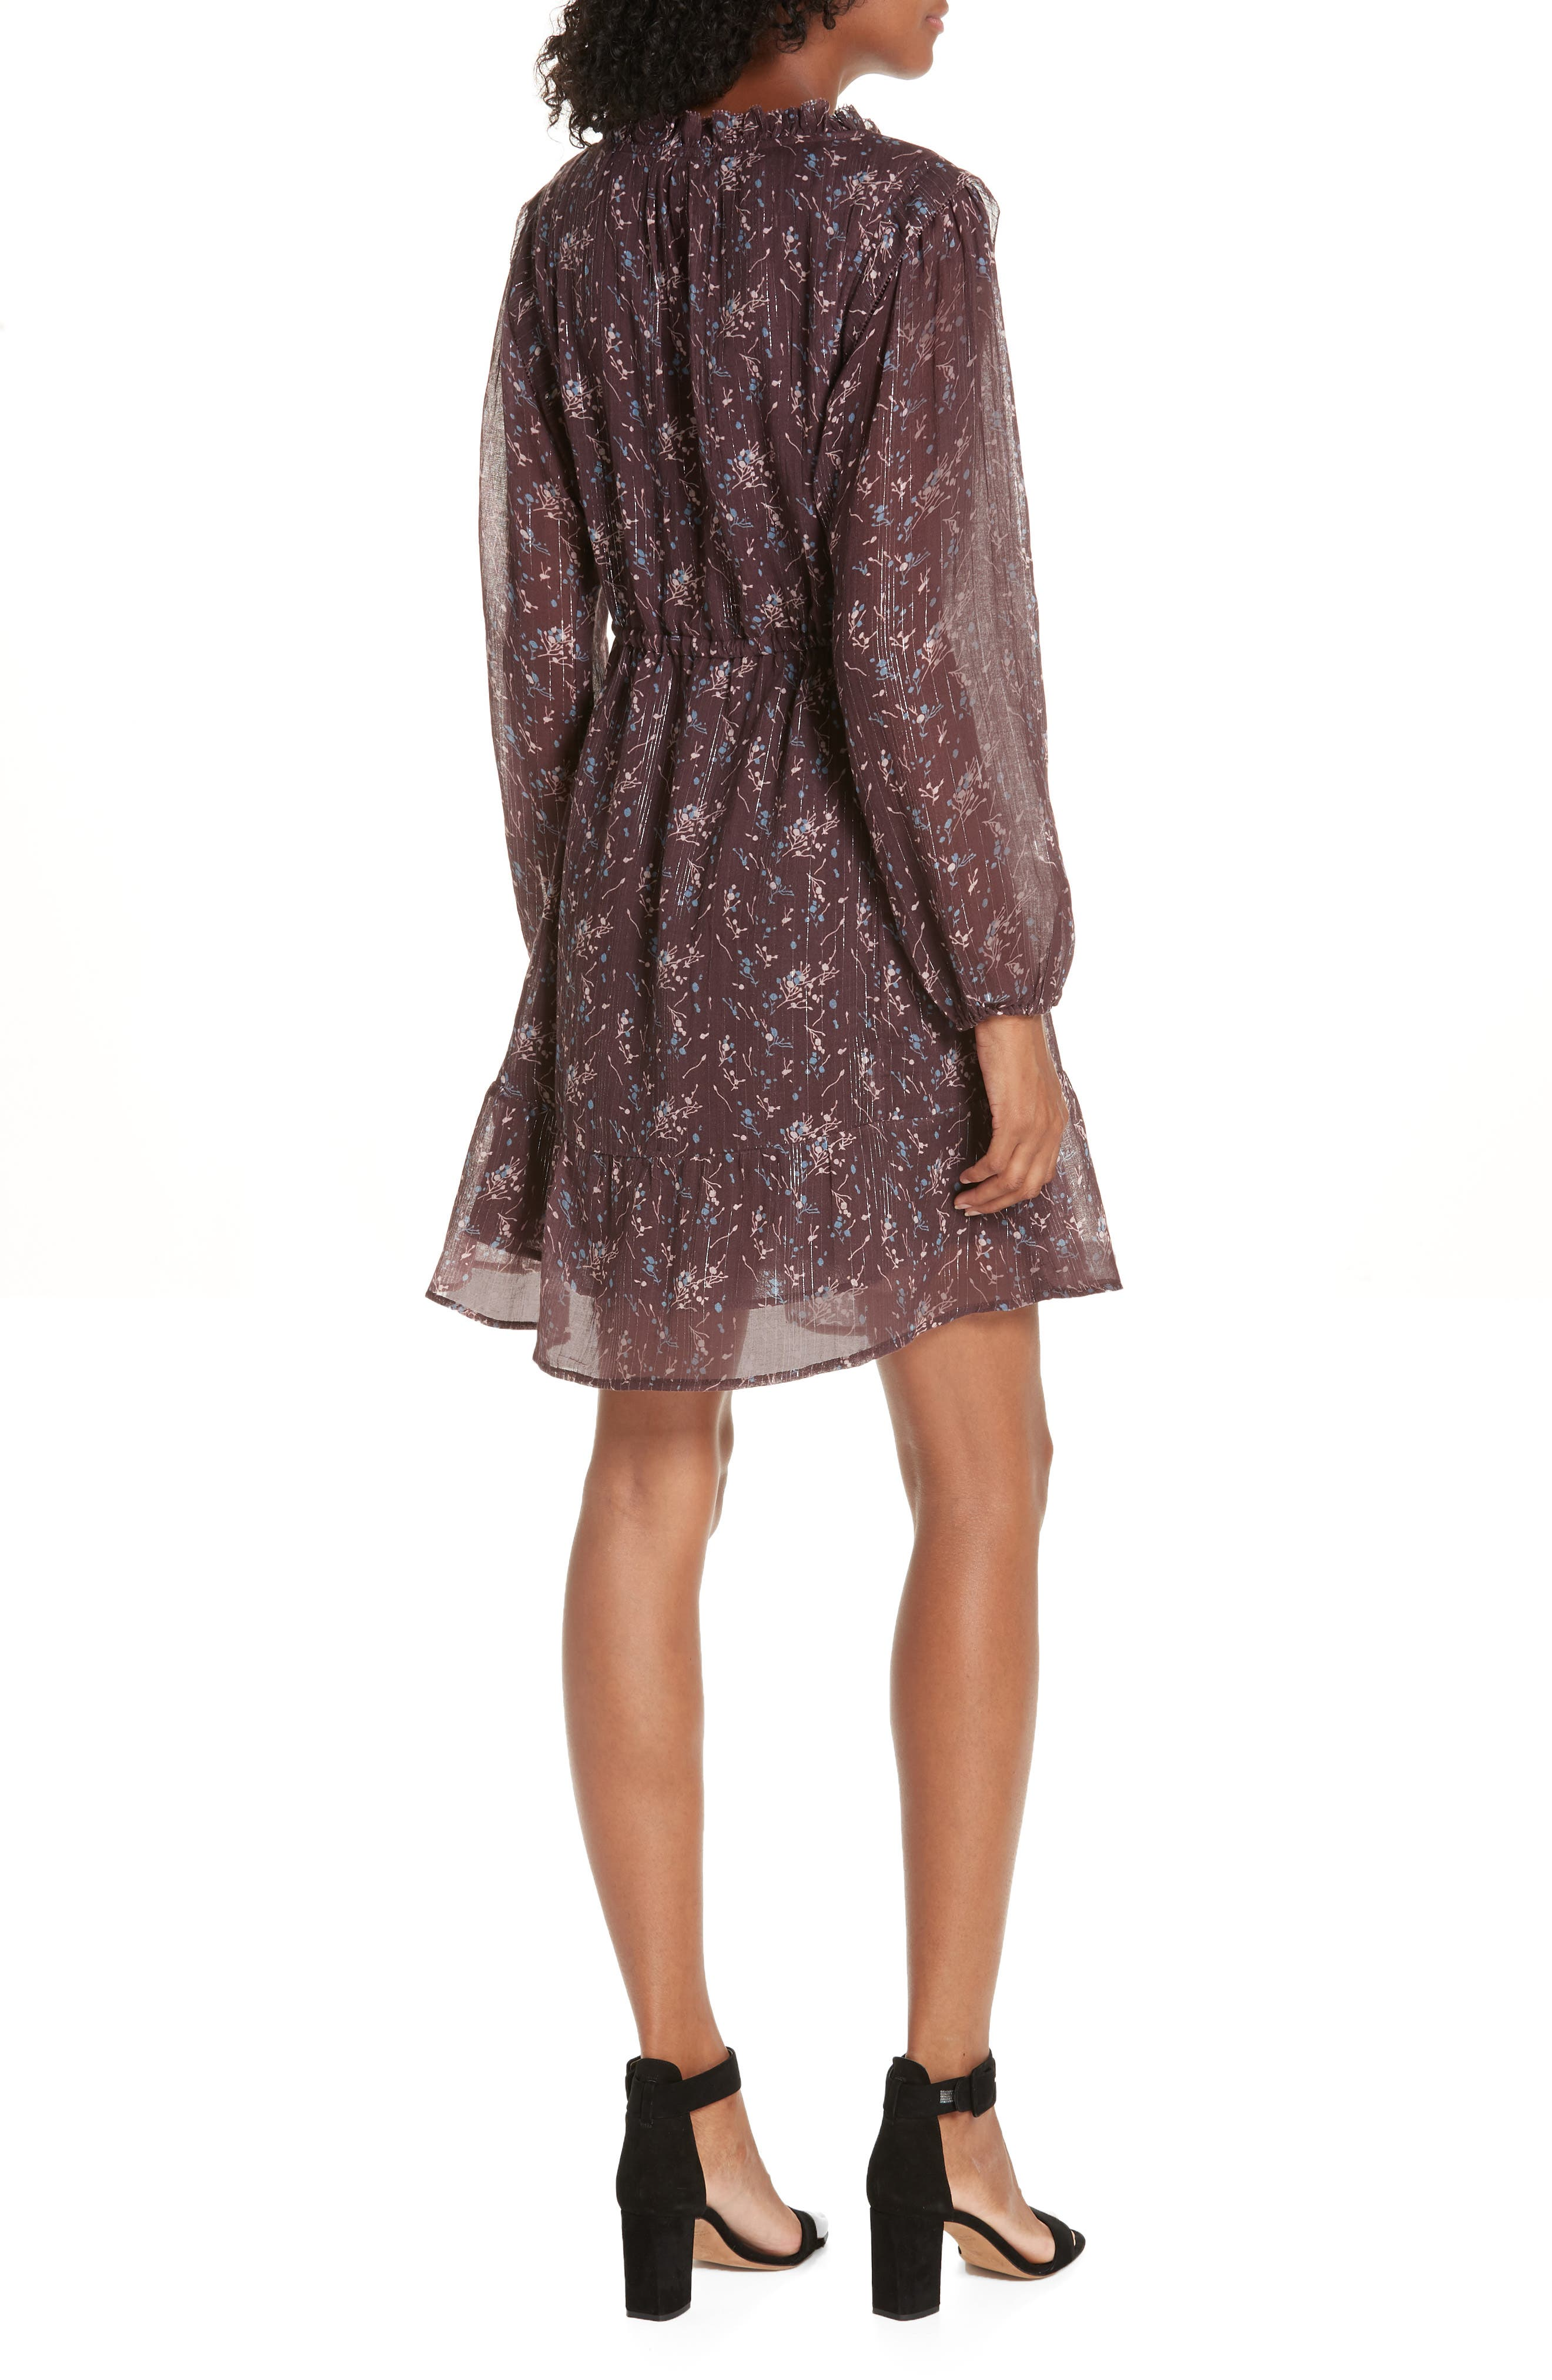 Ruffled Drawstring Waist Dress,                             Alternate thumbnail 2, color,                             BROWN PLUM BLOSSOM